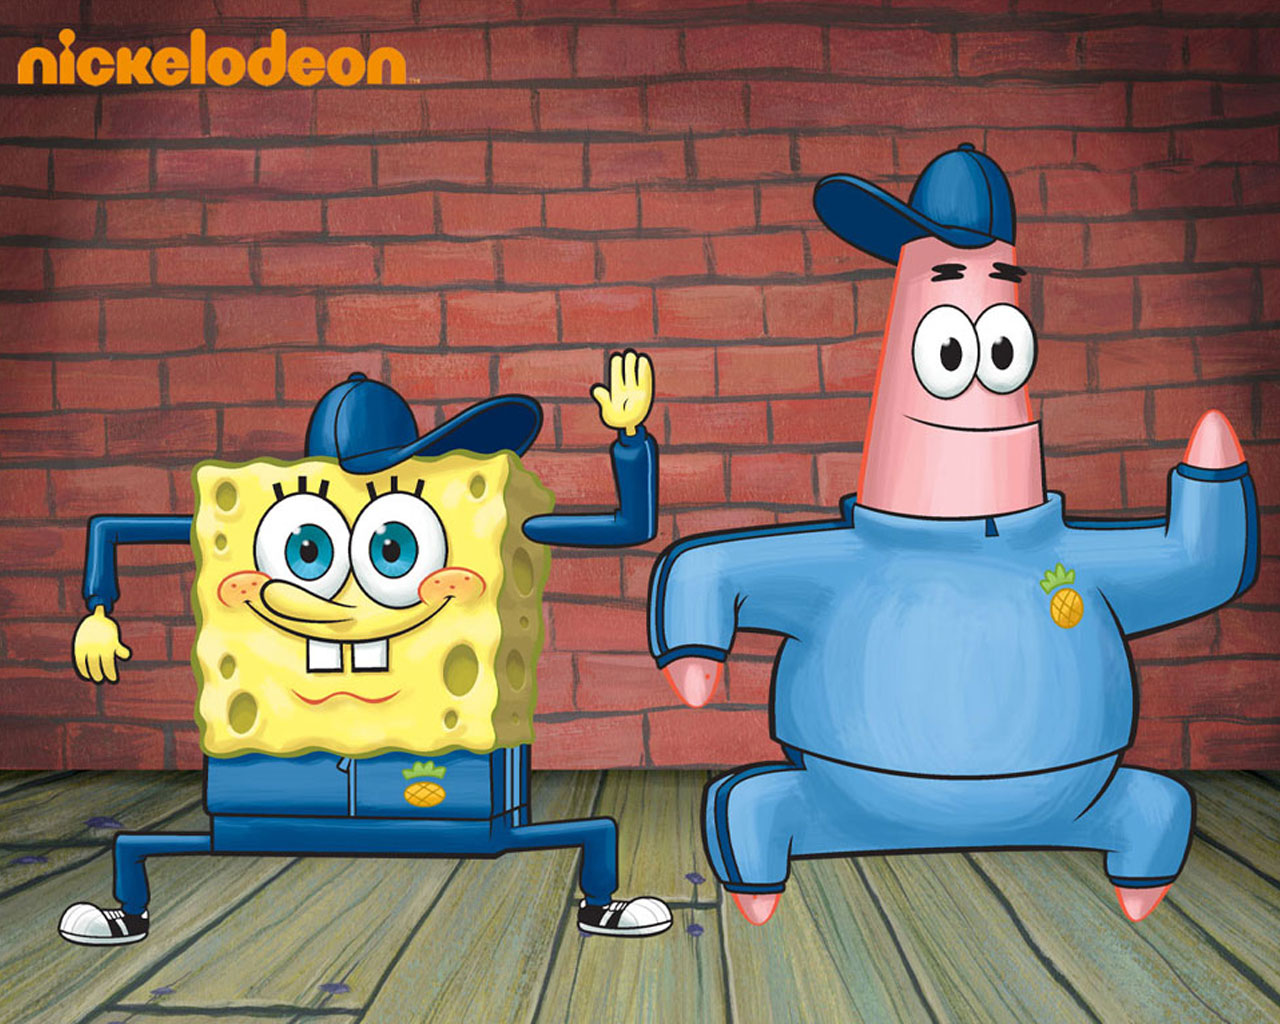 Spongebob Squarepants Images Spongebob Patrick Hd Wallpaper And